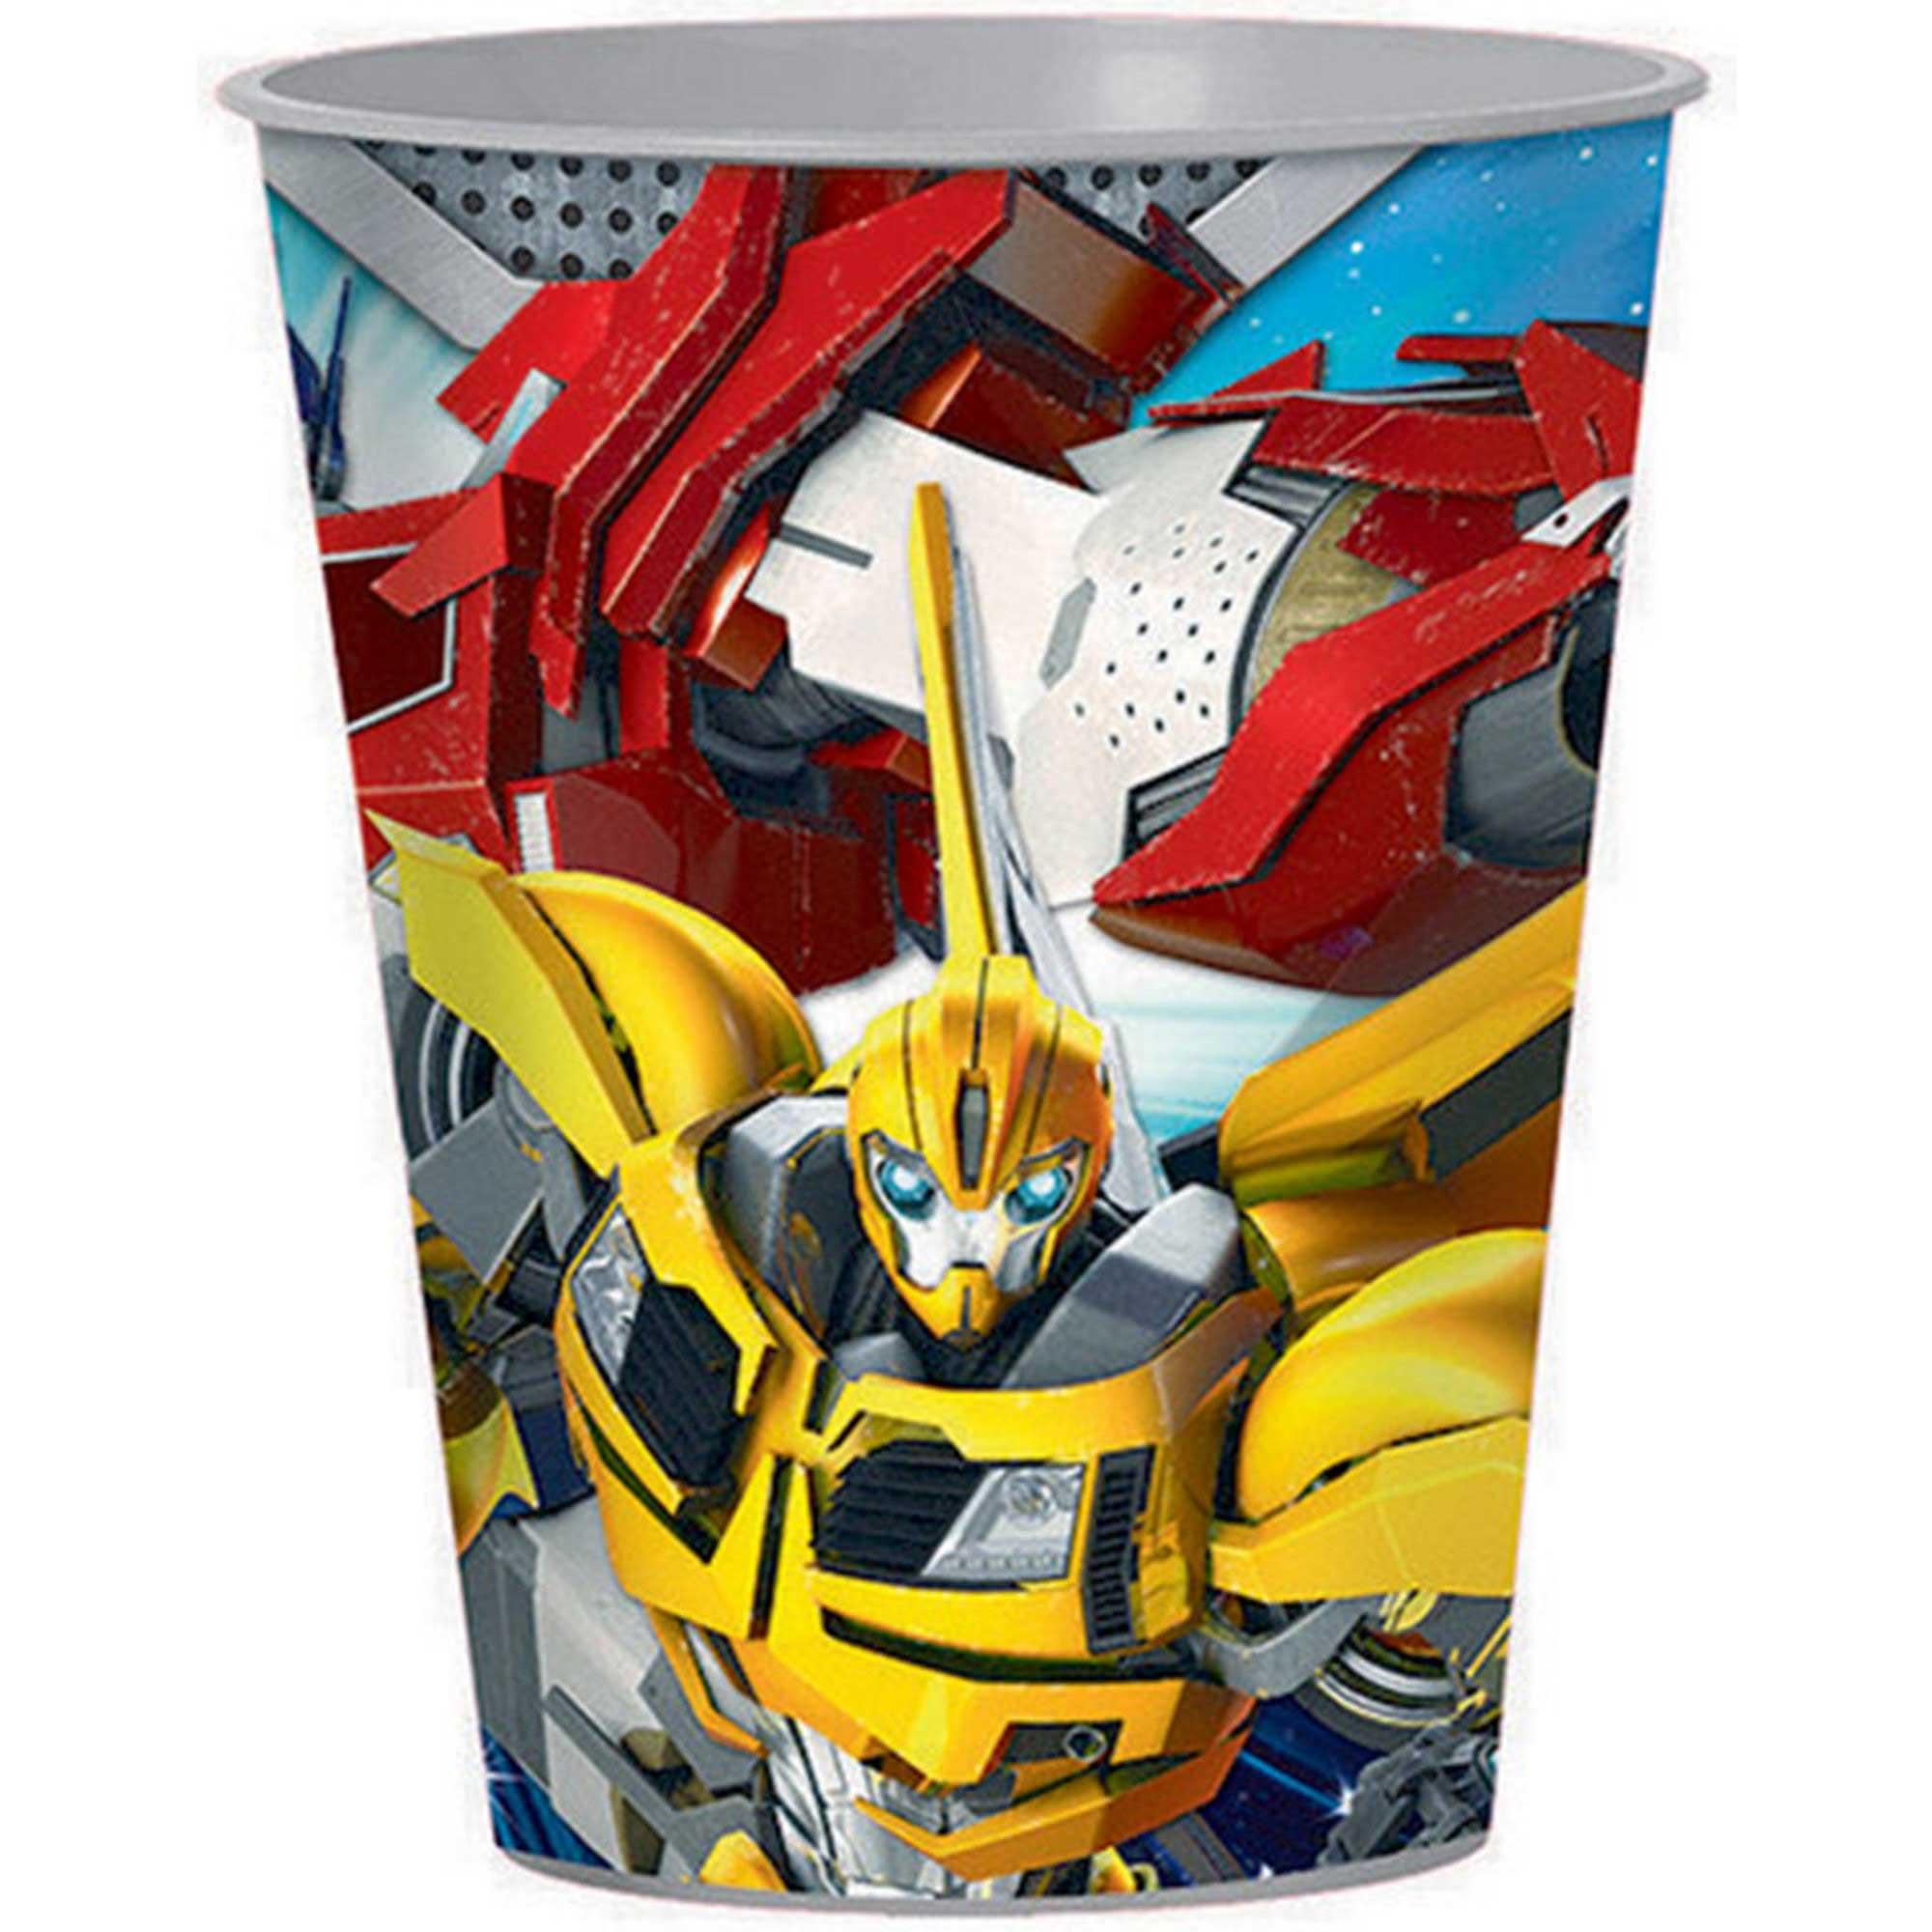 Transformers Core 473ml Favor Cup - Plastic - Plastic